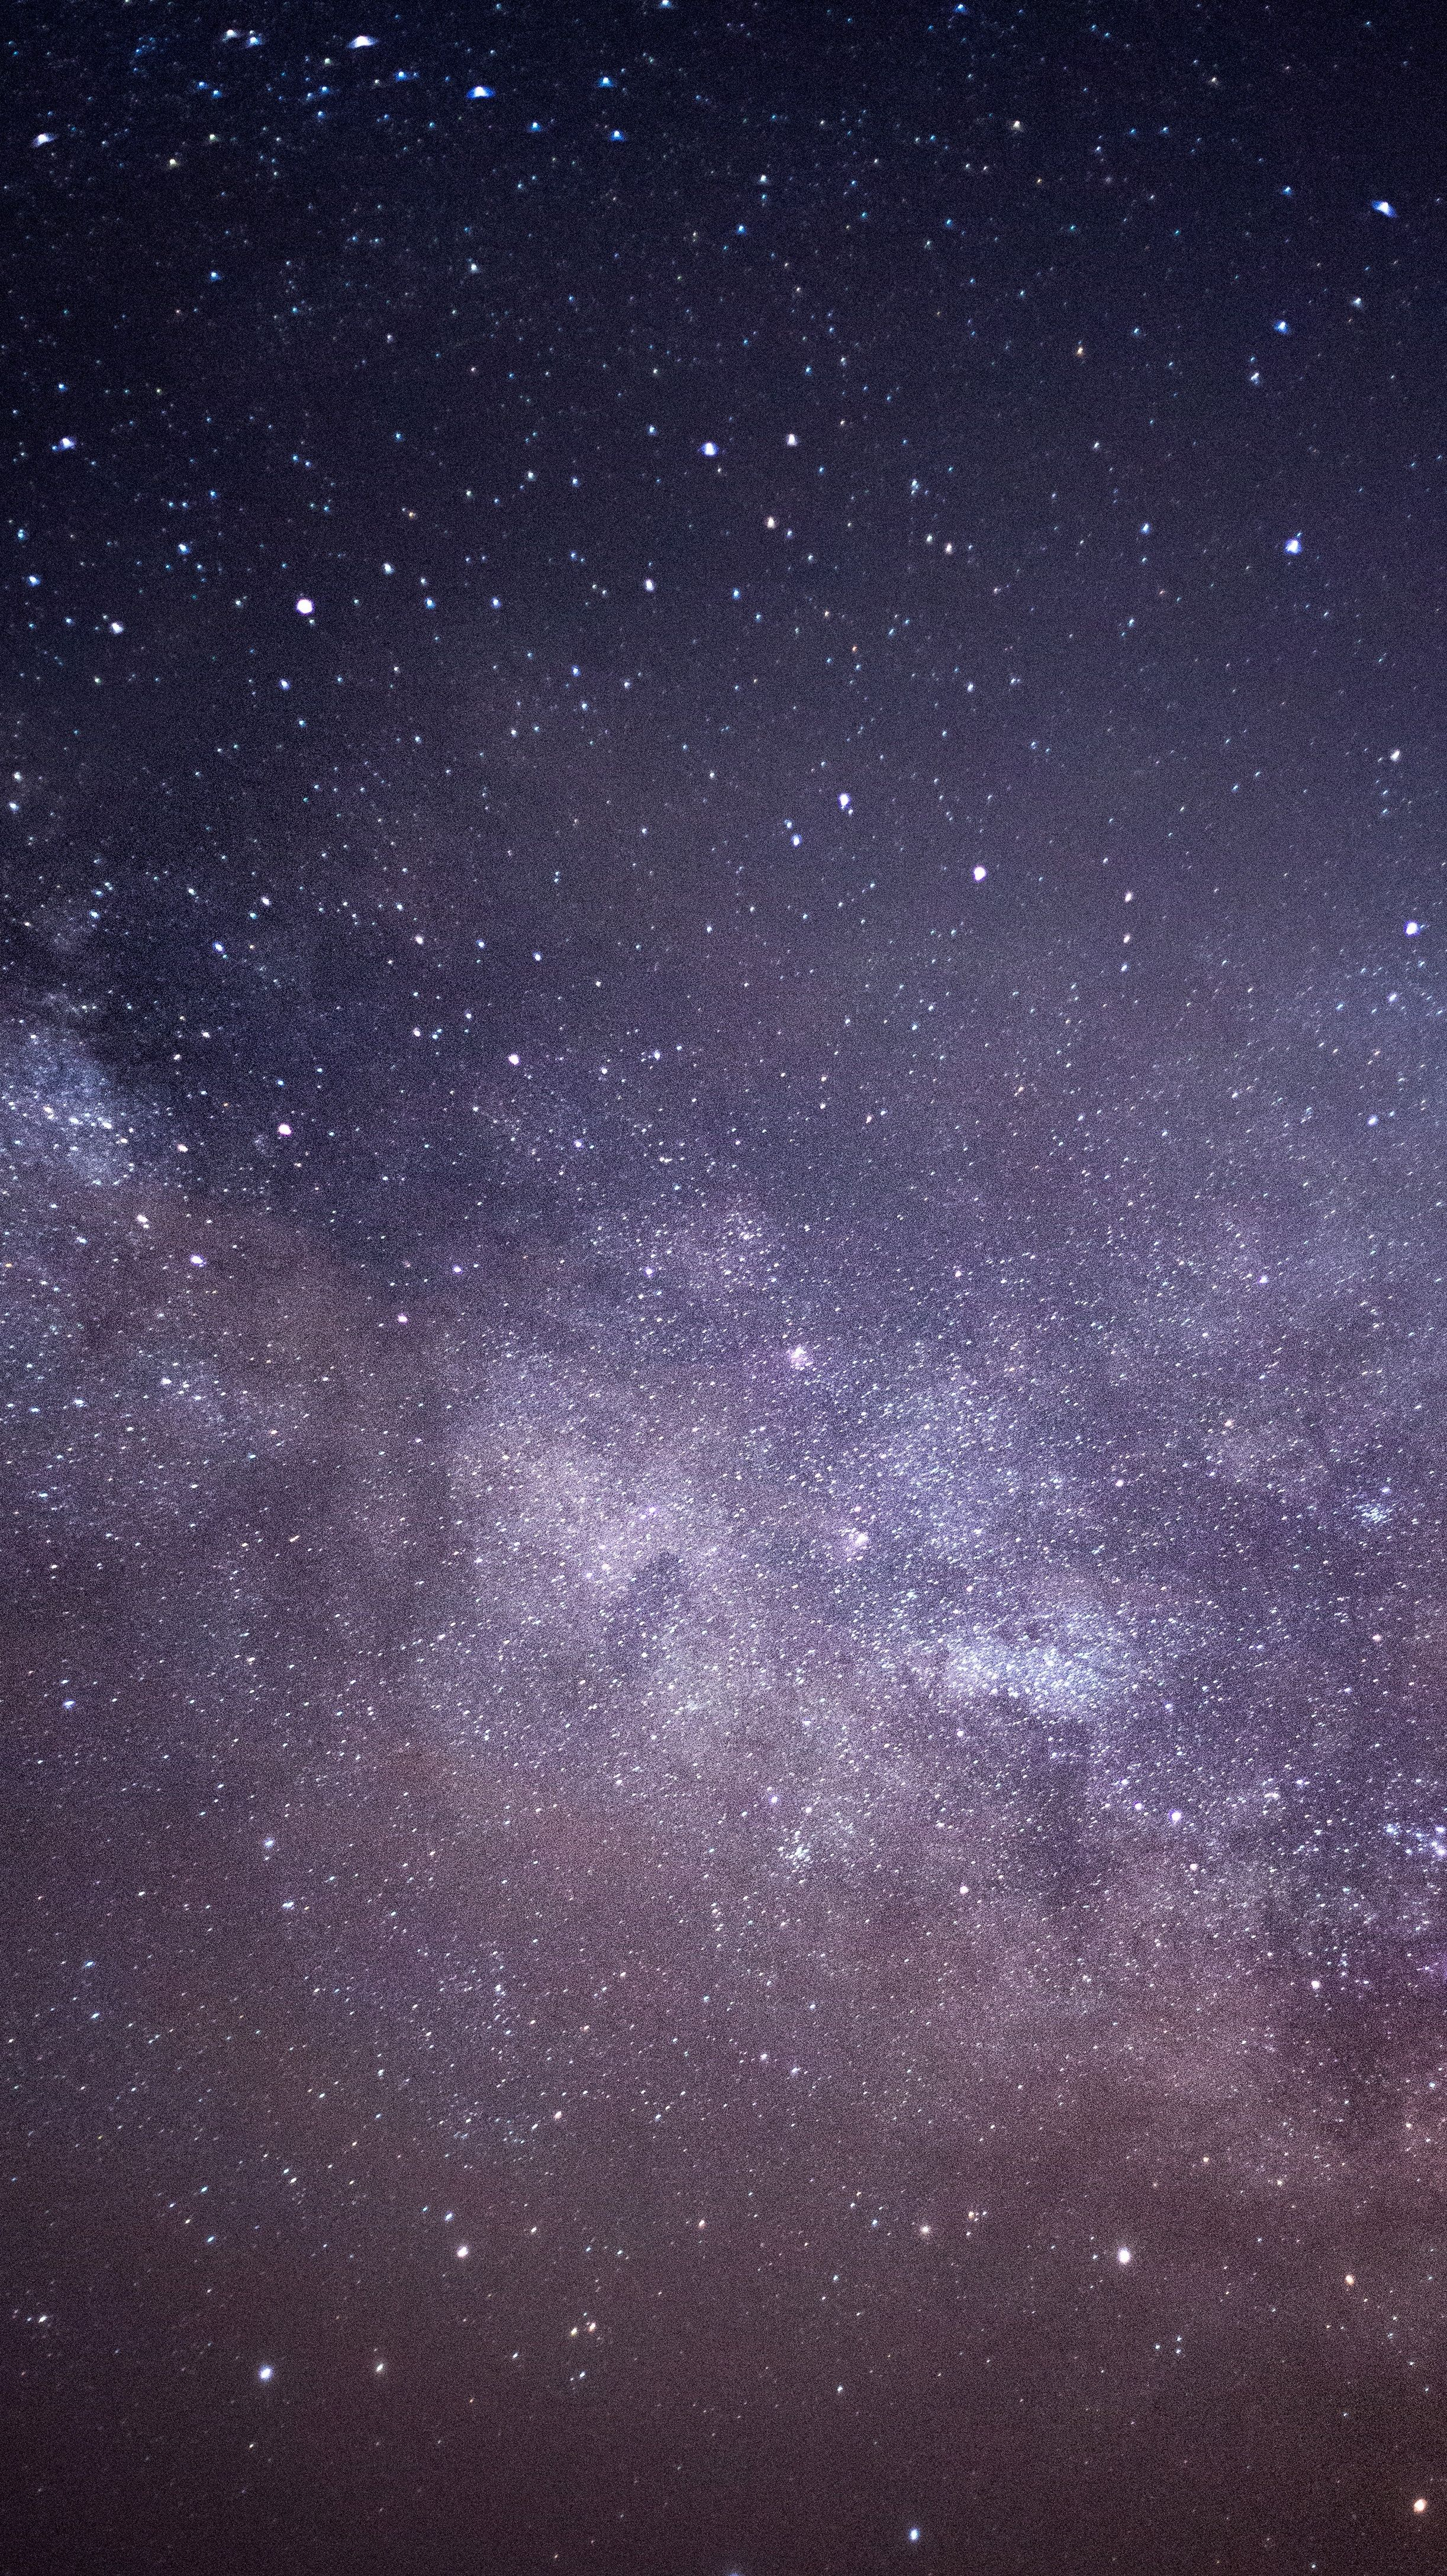 Stars In The Night Sky Night Sky Wallpaper Starry Night Wallpaper Night Sky Photography Wallpaper milky way starry night nebula